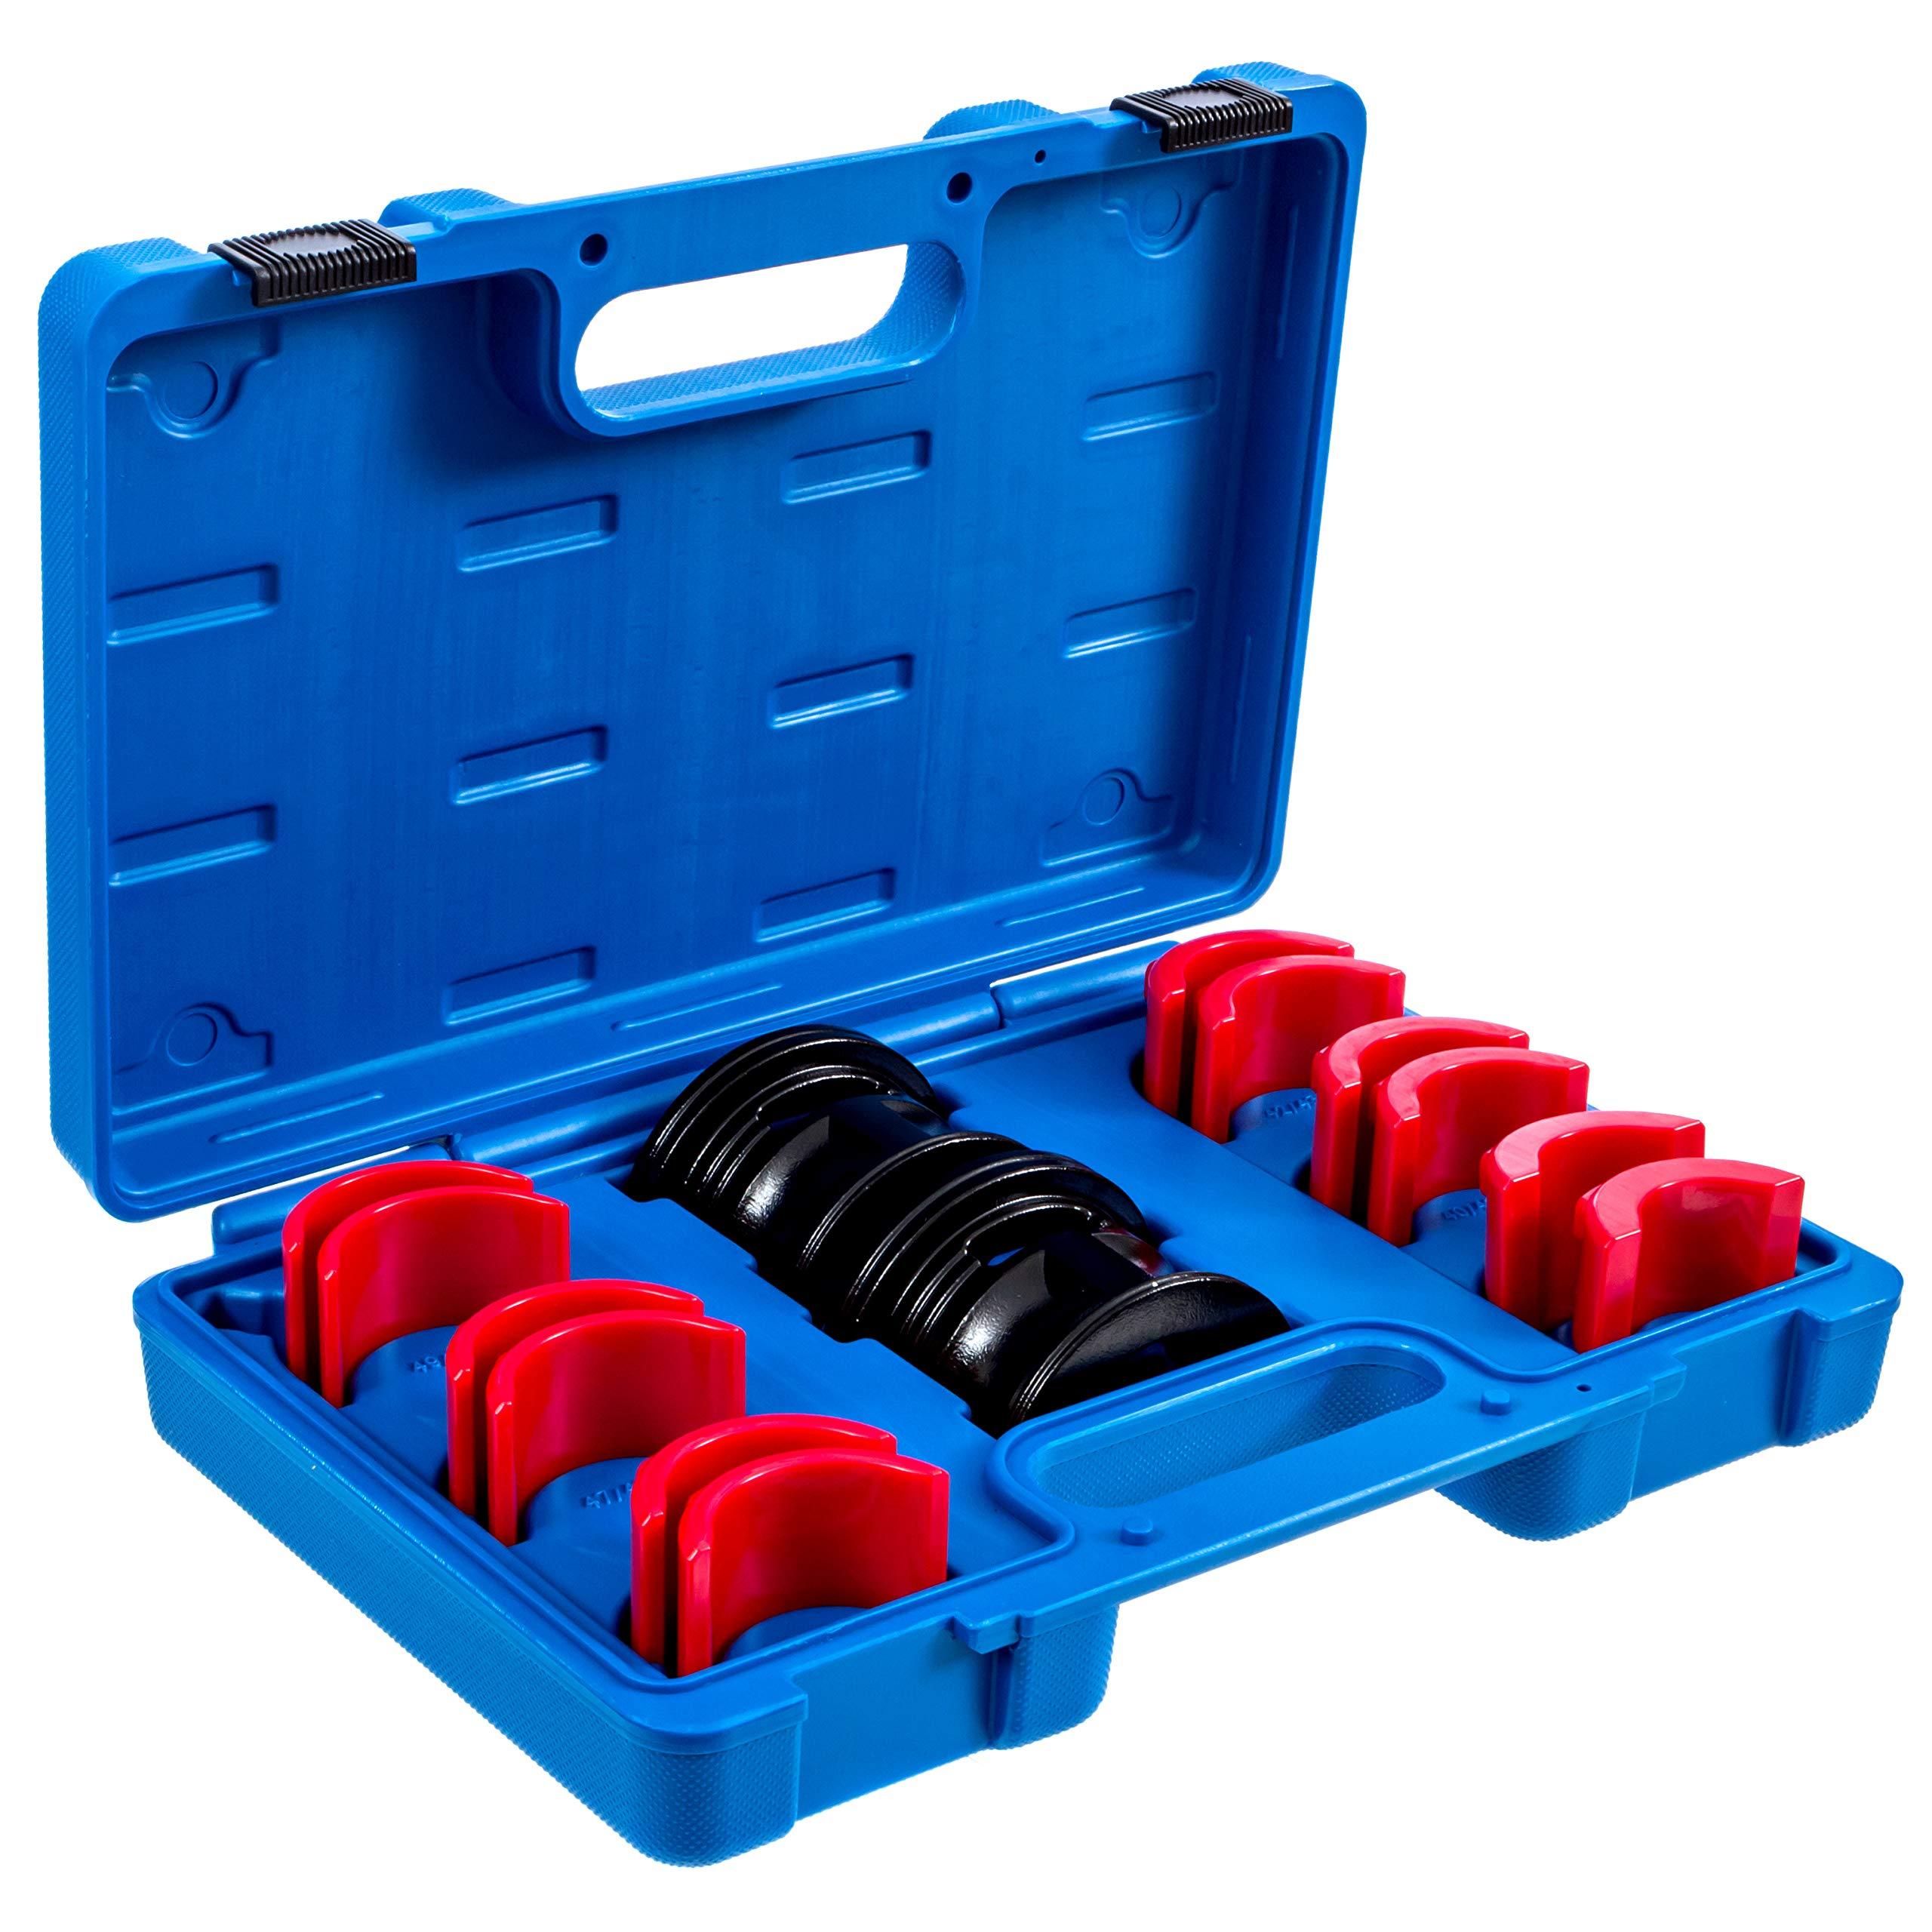 ALPHA MOTO Universal Fork Seal Driver Tool Kit 35mm 36mm 40mm 41mm 42mm 43mm 45mm 46mm 47mm 48mm 49mm 50mm by ALPHA MOTO